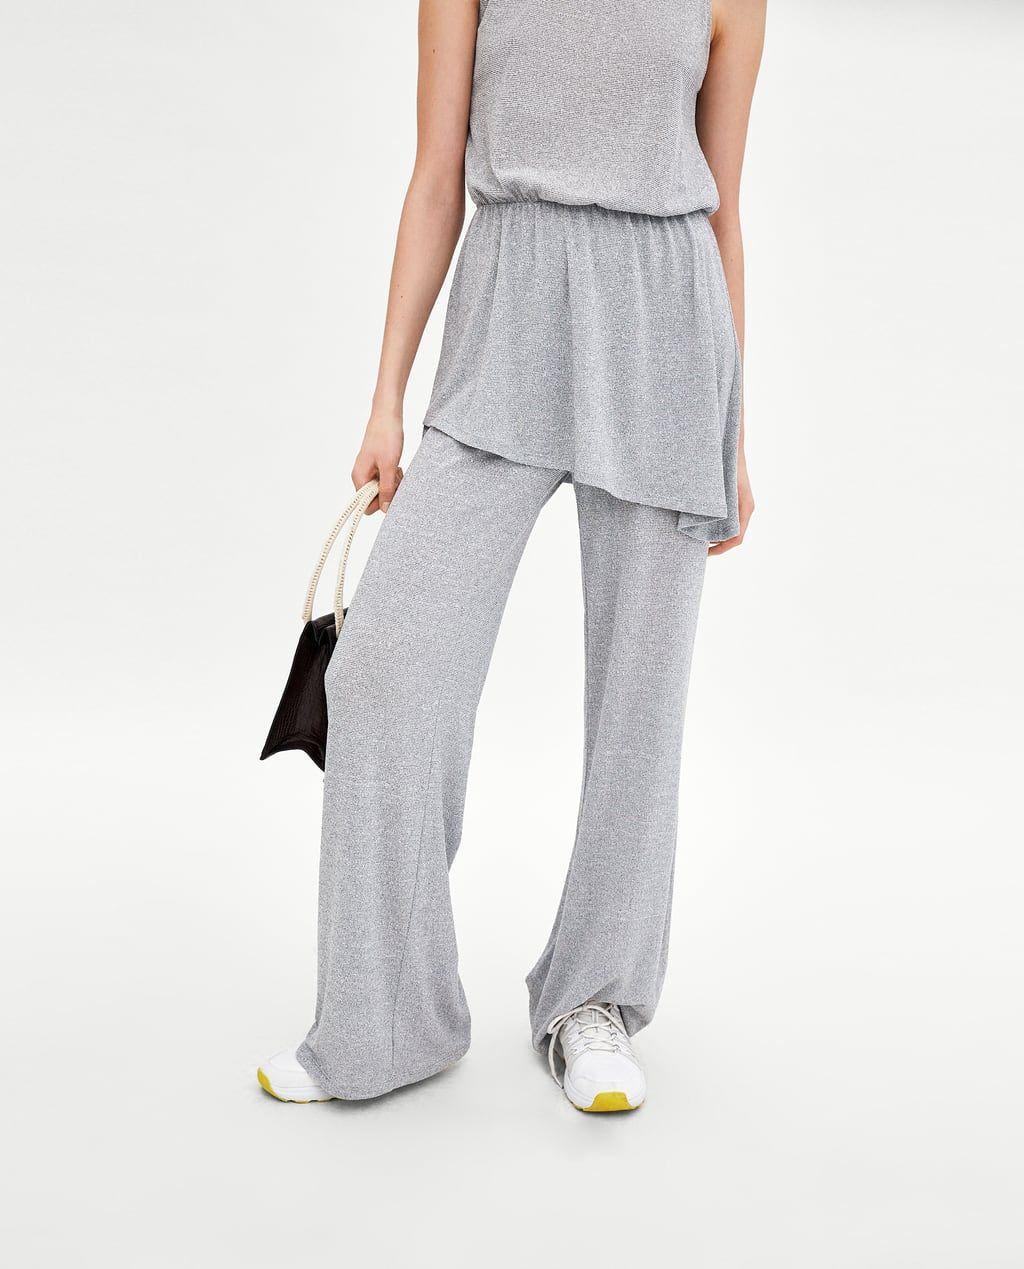 Imagen Zara 3 18e Trousers Fluido Ss18 De Pantalón TqSdpw 32443e0714cb